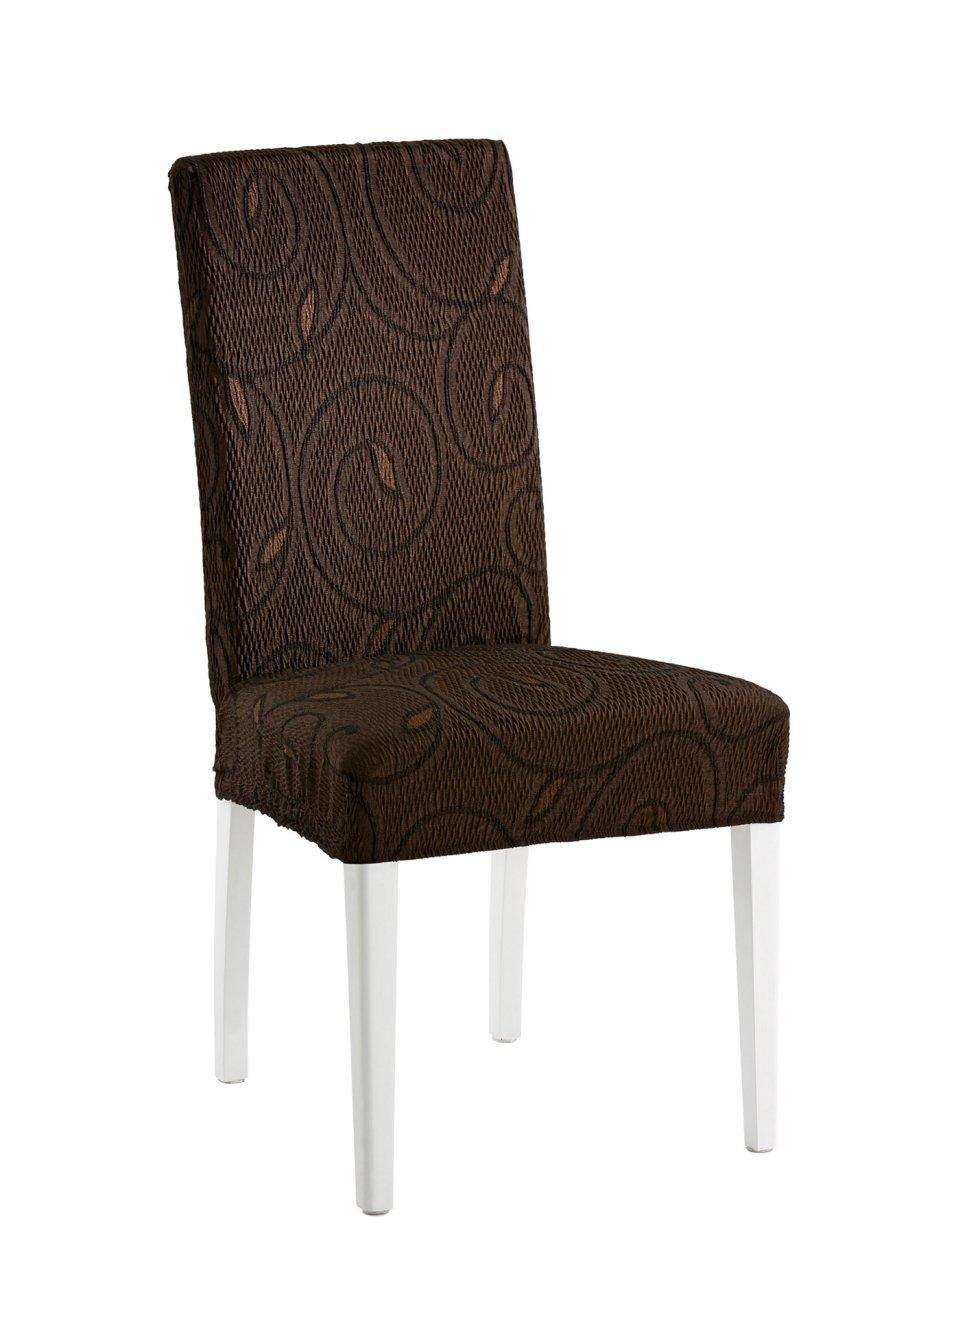 stuhlhusse milan braun bpc living. Black Bedroom Furniture Sets. Home Design Ideas